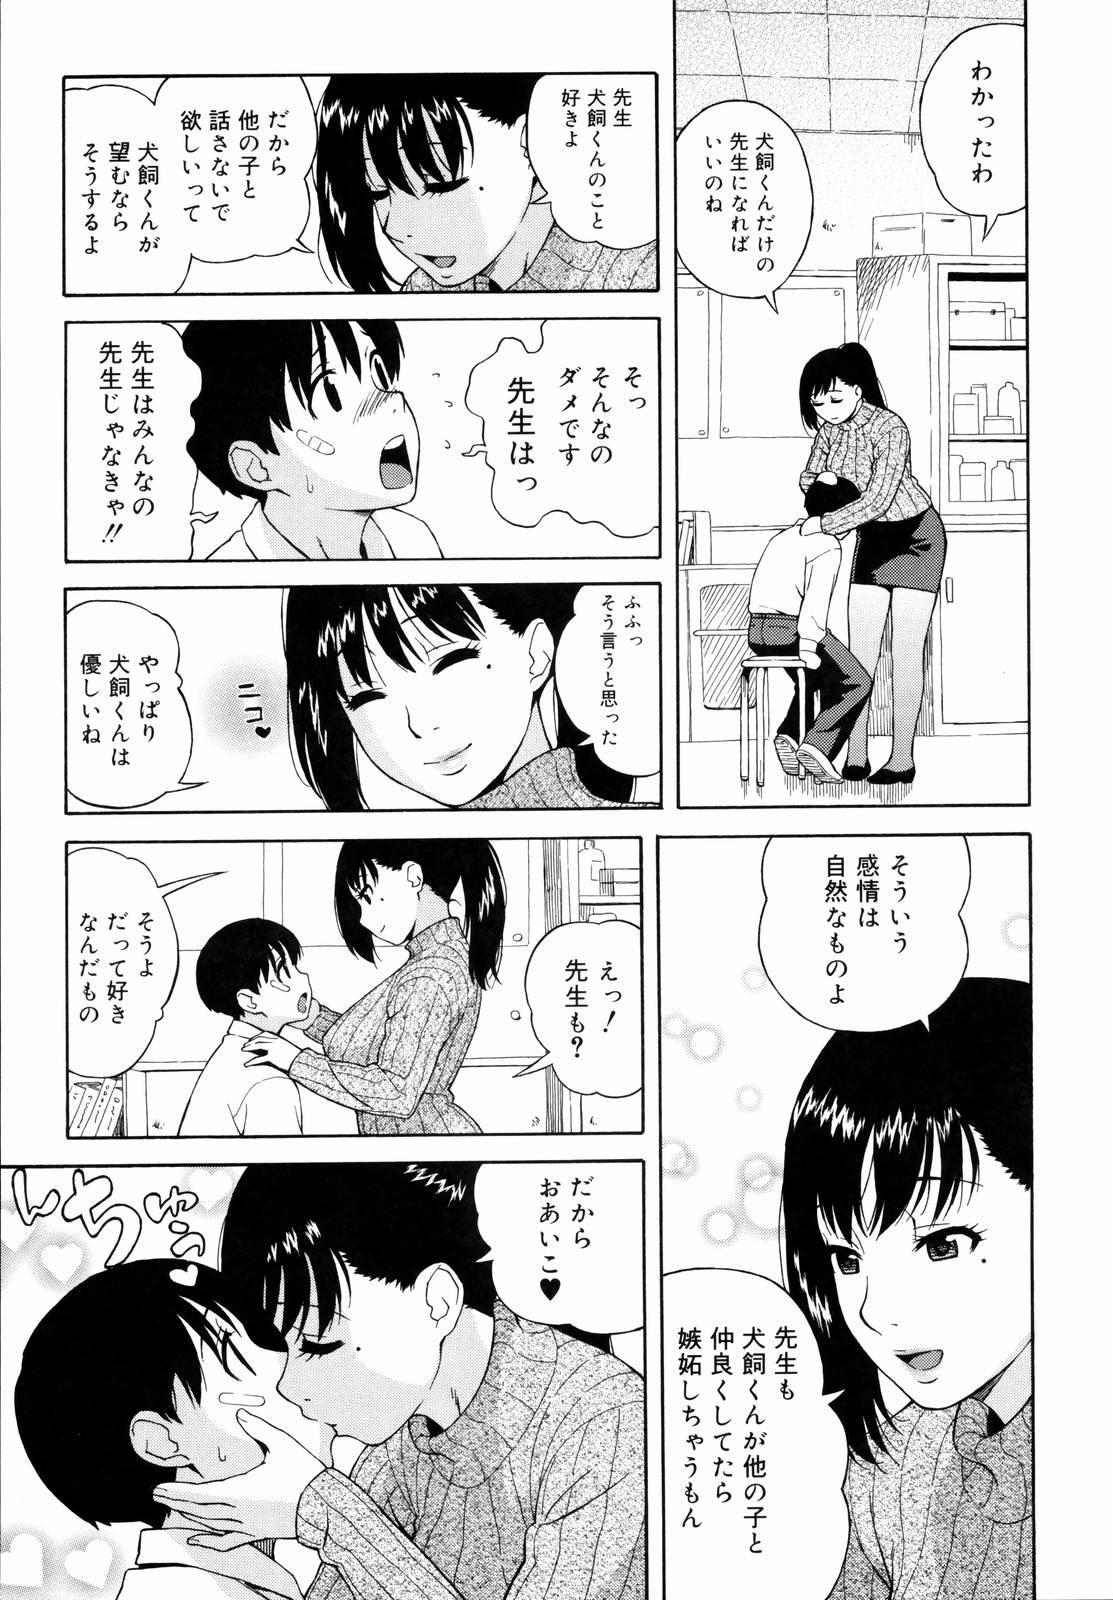 Shishunki wa Hatsujouki - Adolescence is a sexual excitement period. 134